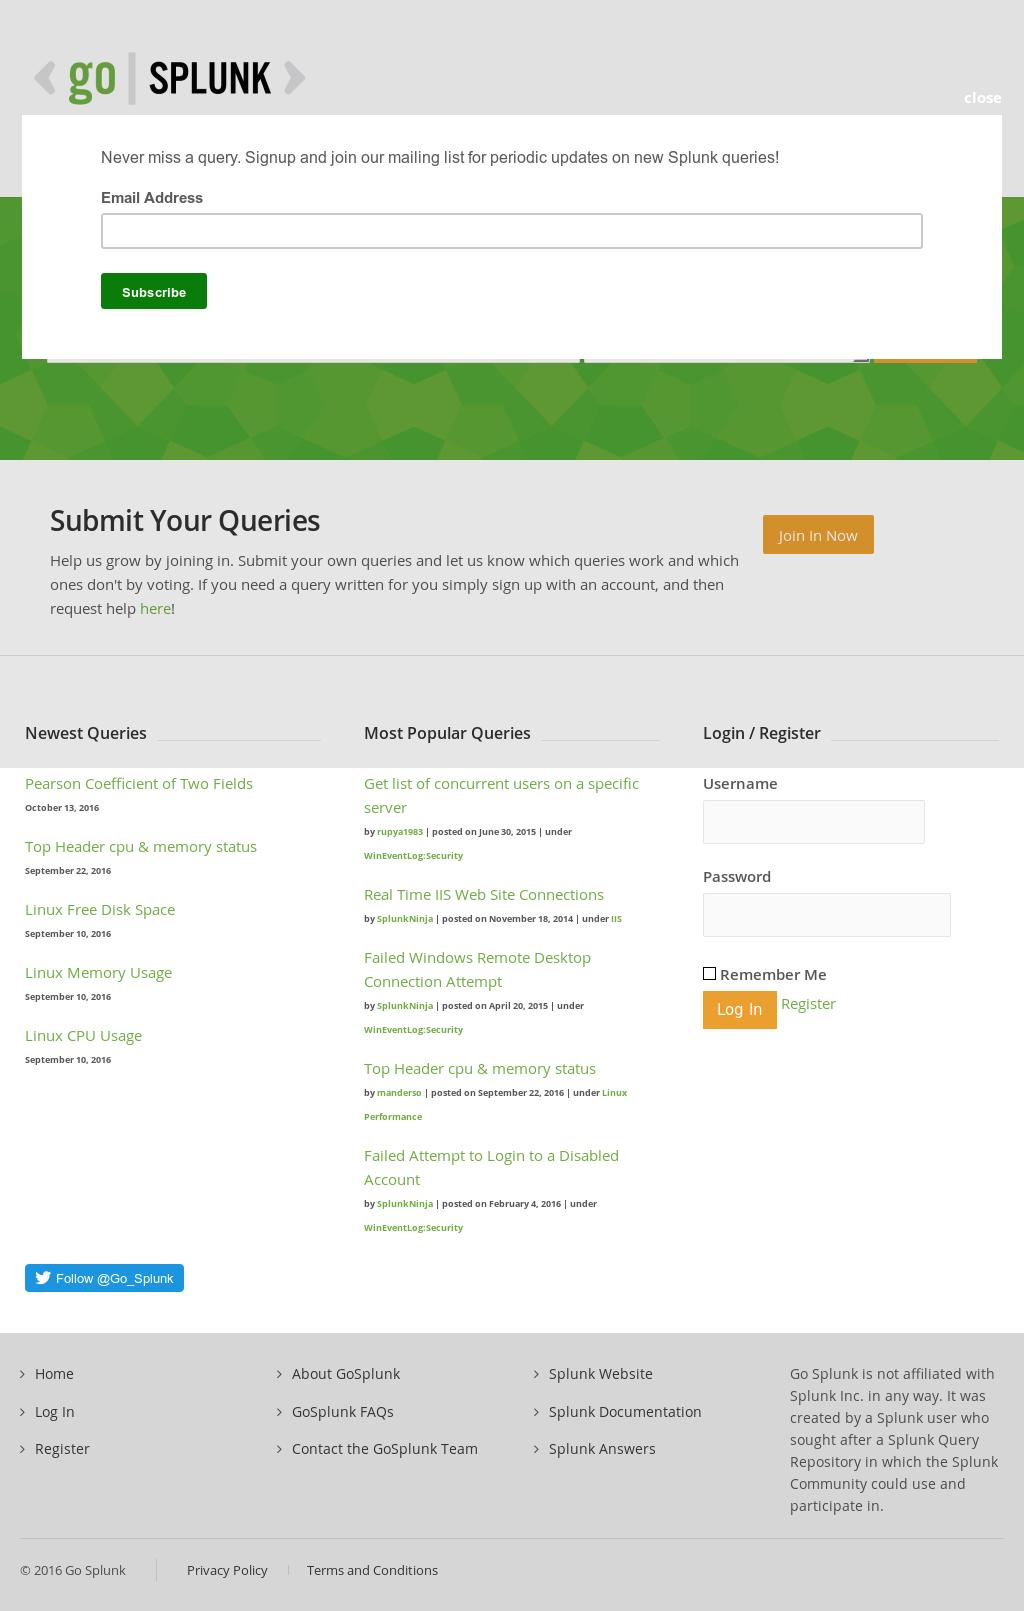 Go Splunk Competitors, Revenue and Employees - Owler Company Profile